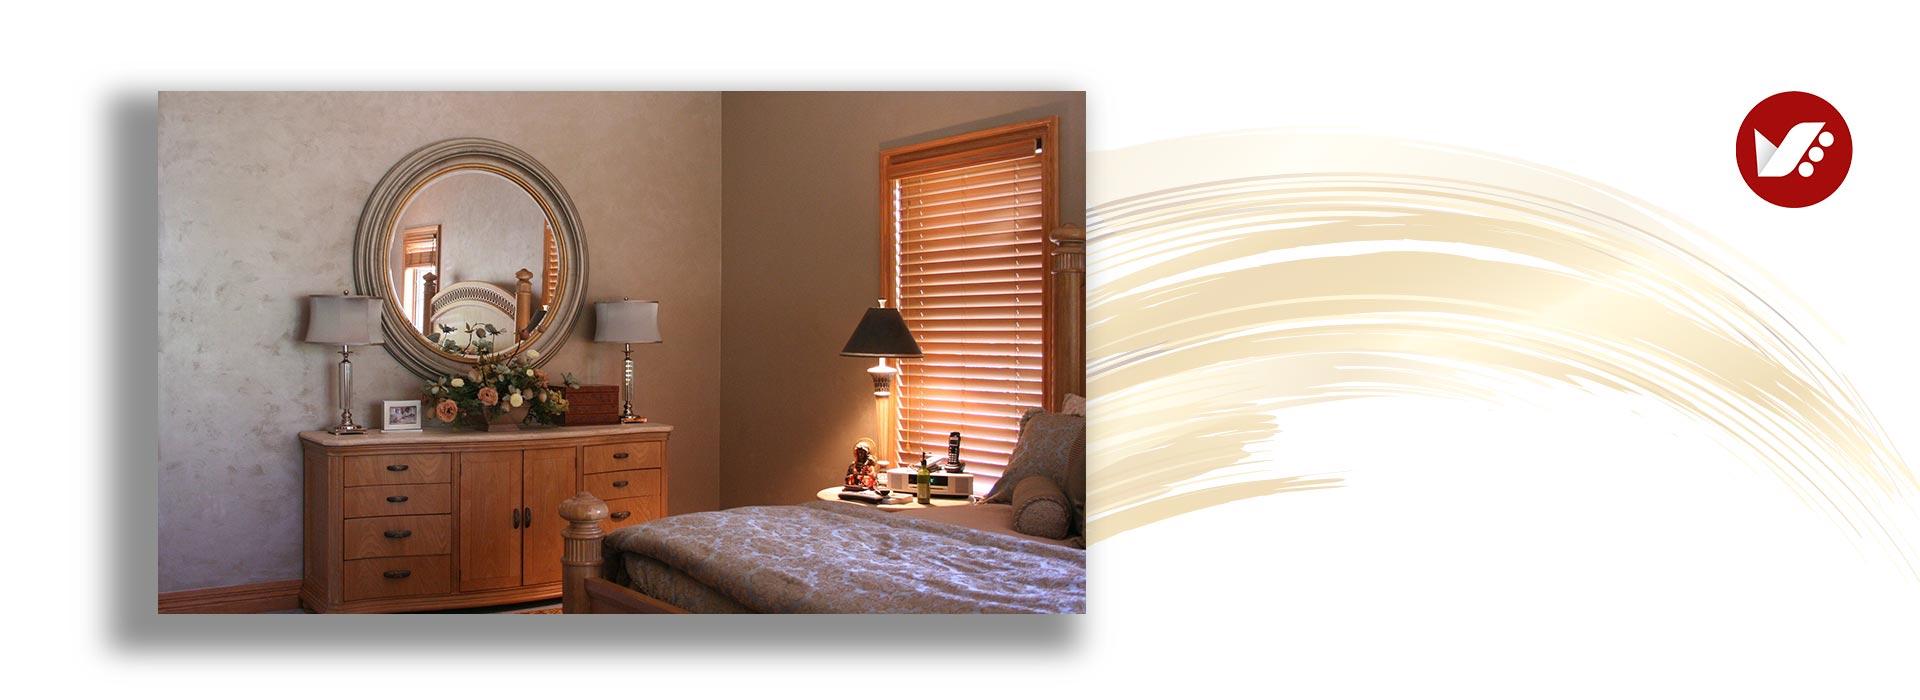 bedroom makeover Lighting - تغییر دکوراسیون اتاق خواب